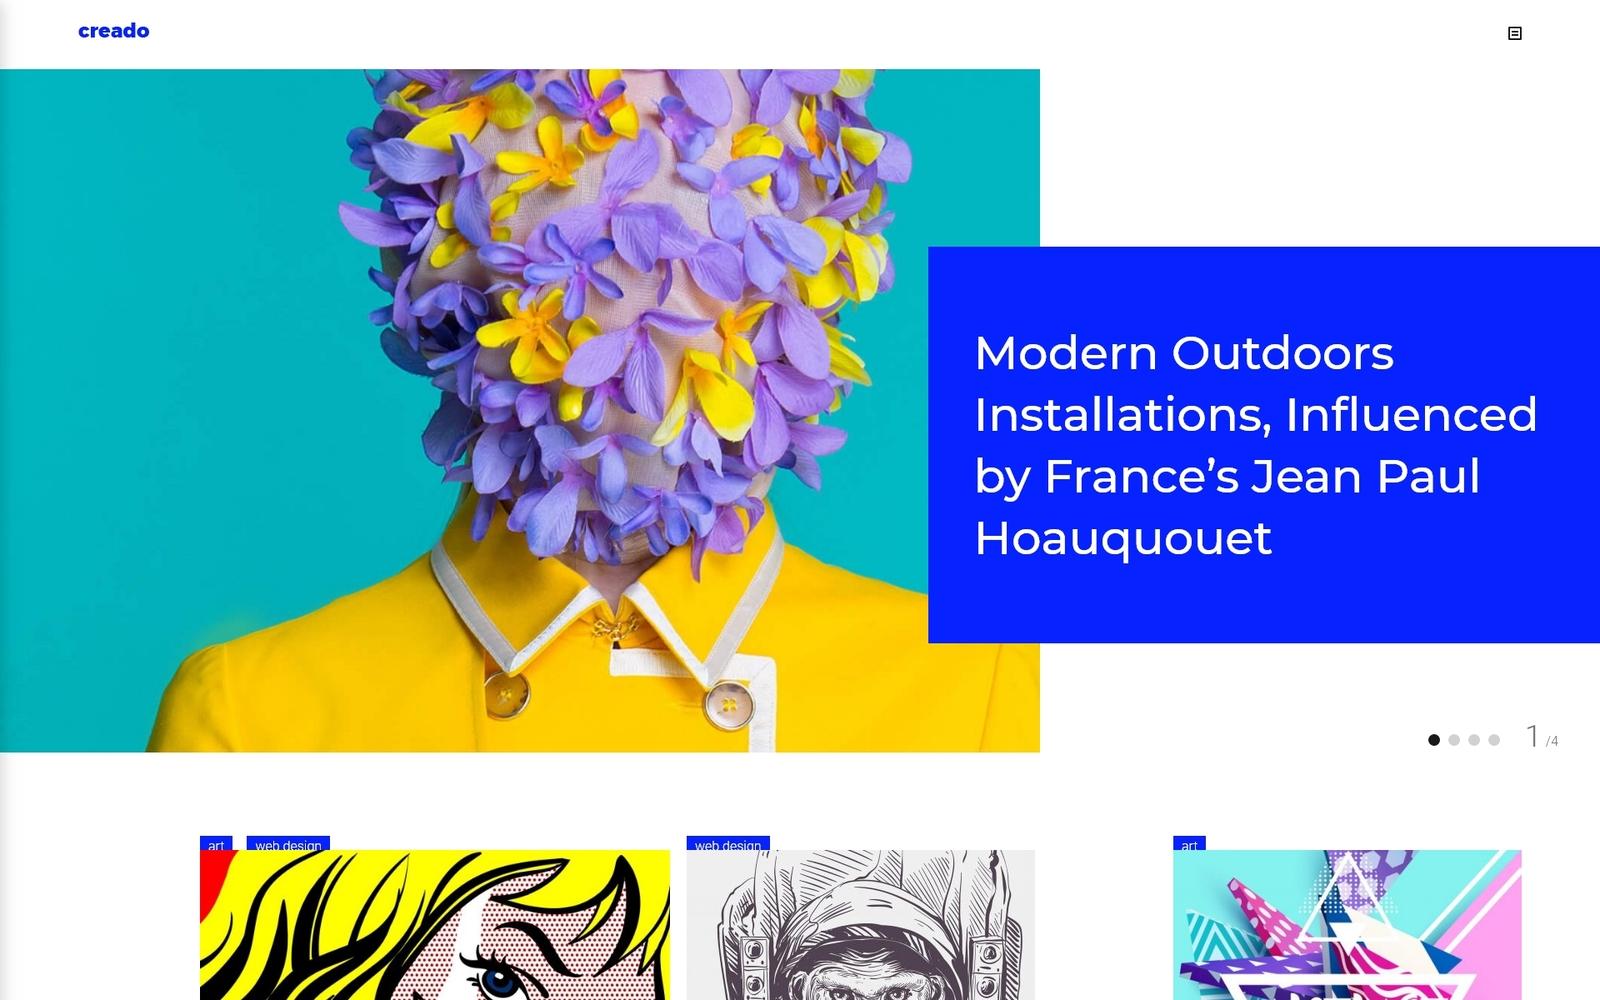 Reszponzív Creado - Art Gallery Responsive WordPress sablon 63661